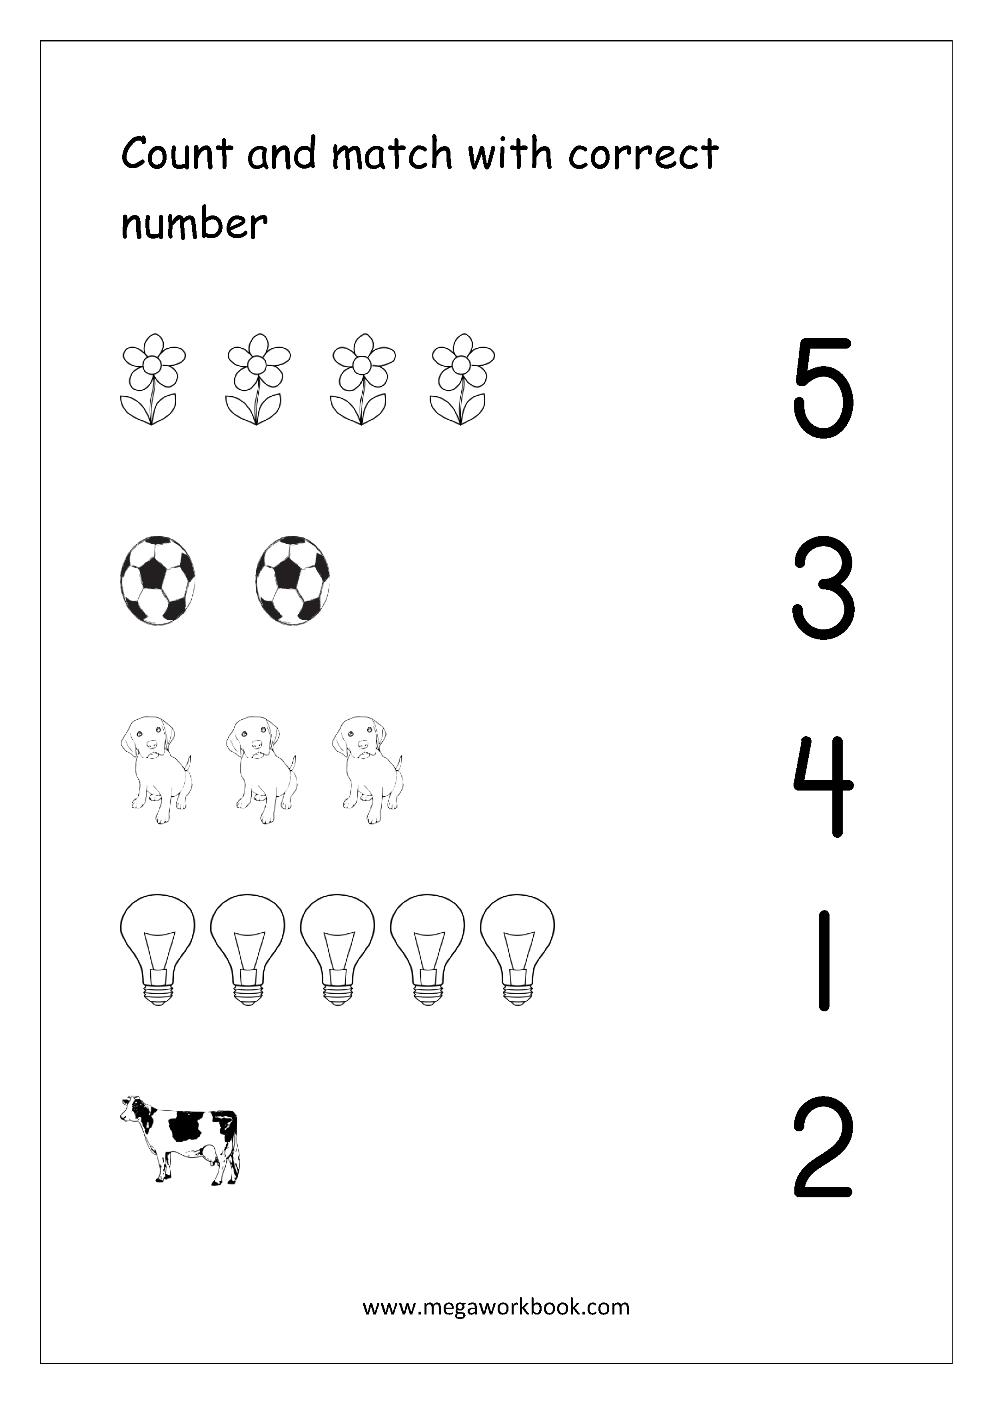 Free Printable Number Matching Worksheets For Kindergarten And | Printable Matching Worksheets For Preschoolers